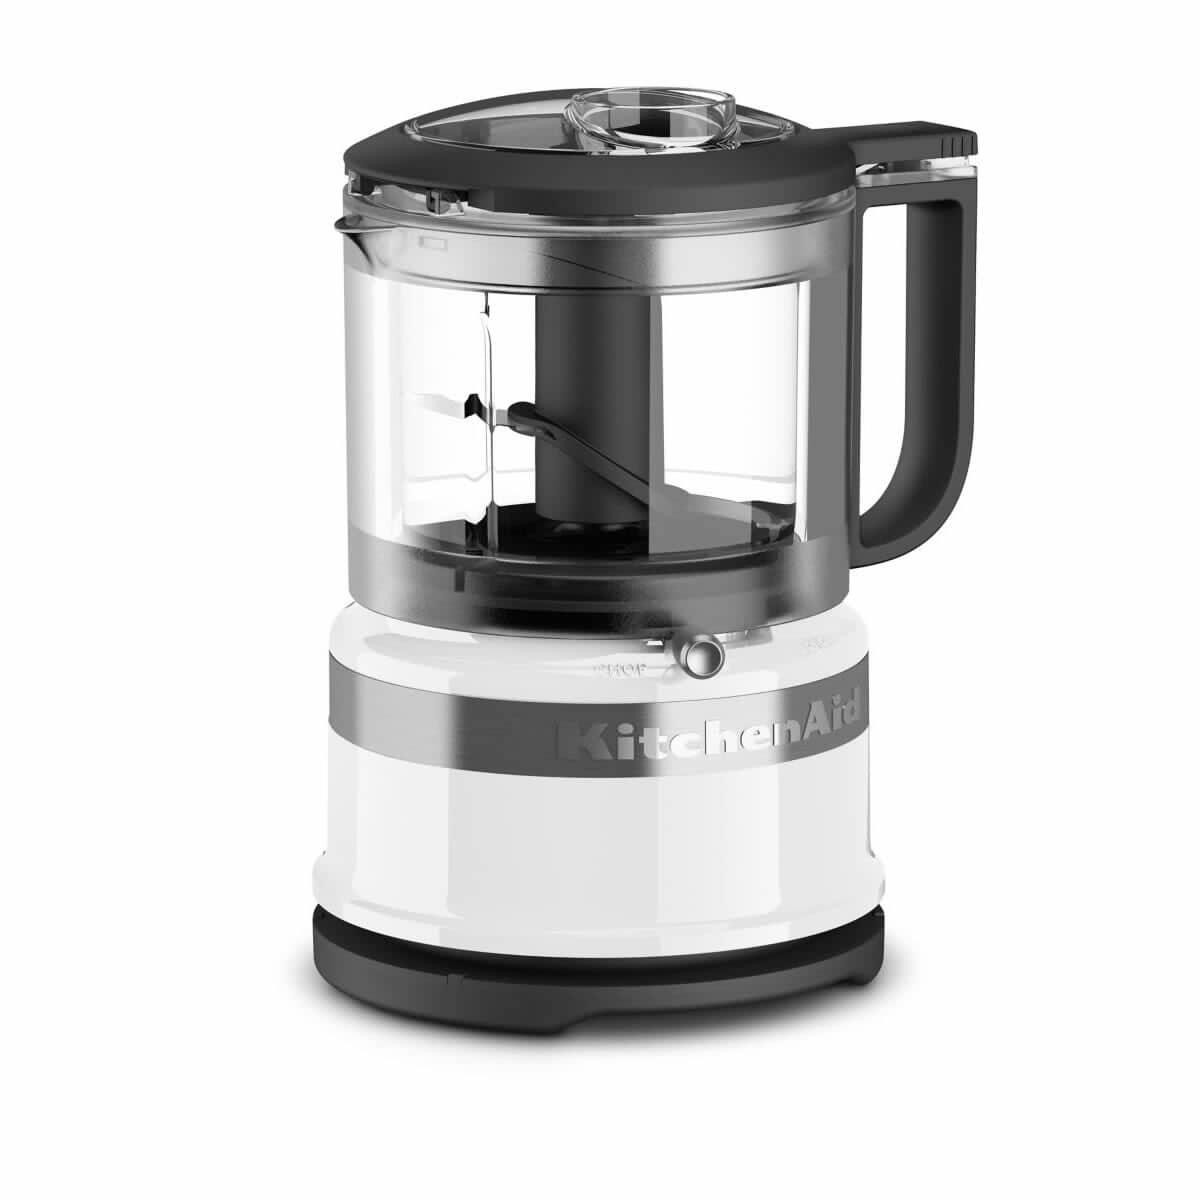 KitchenAid Mini Food Processor White - (5KFC3516BWH) - eCookshop